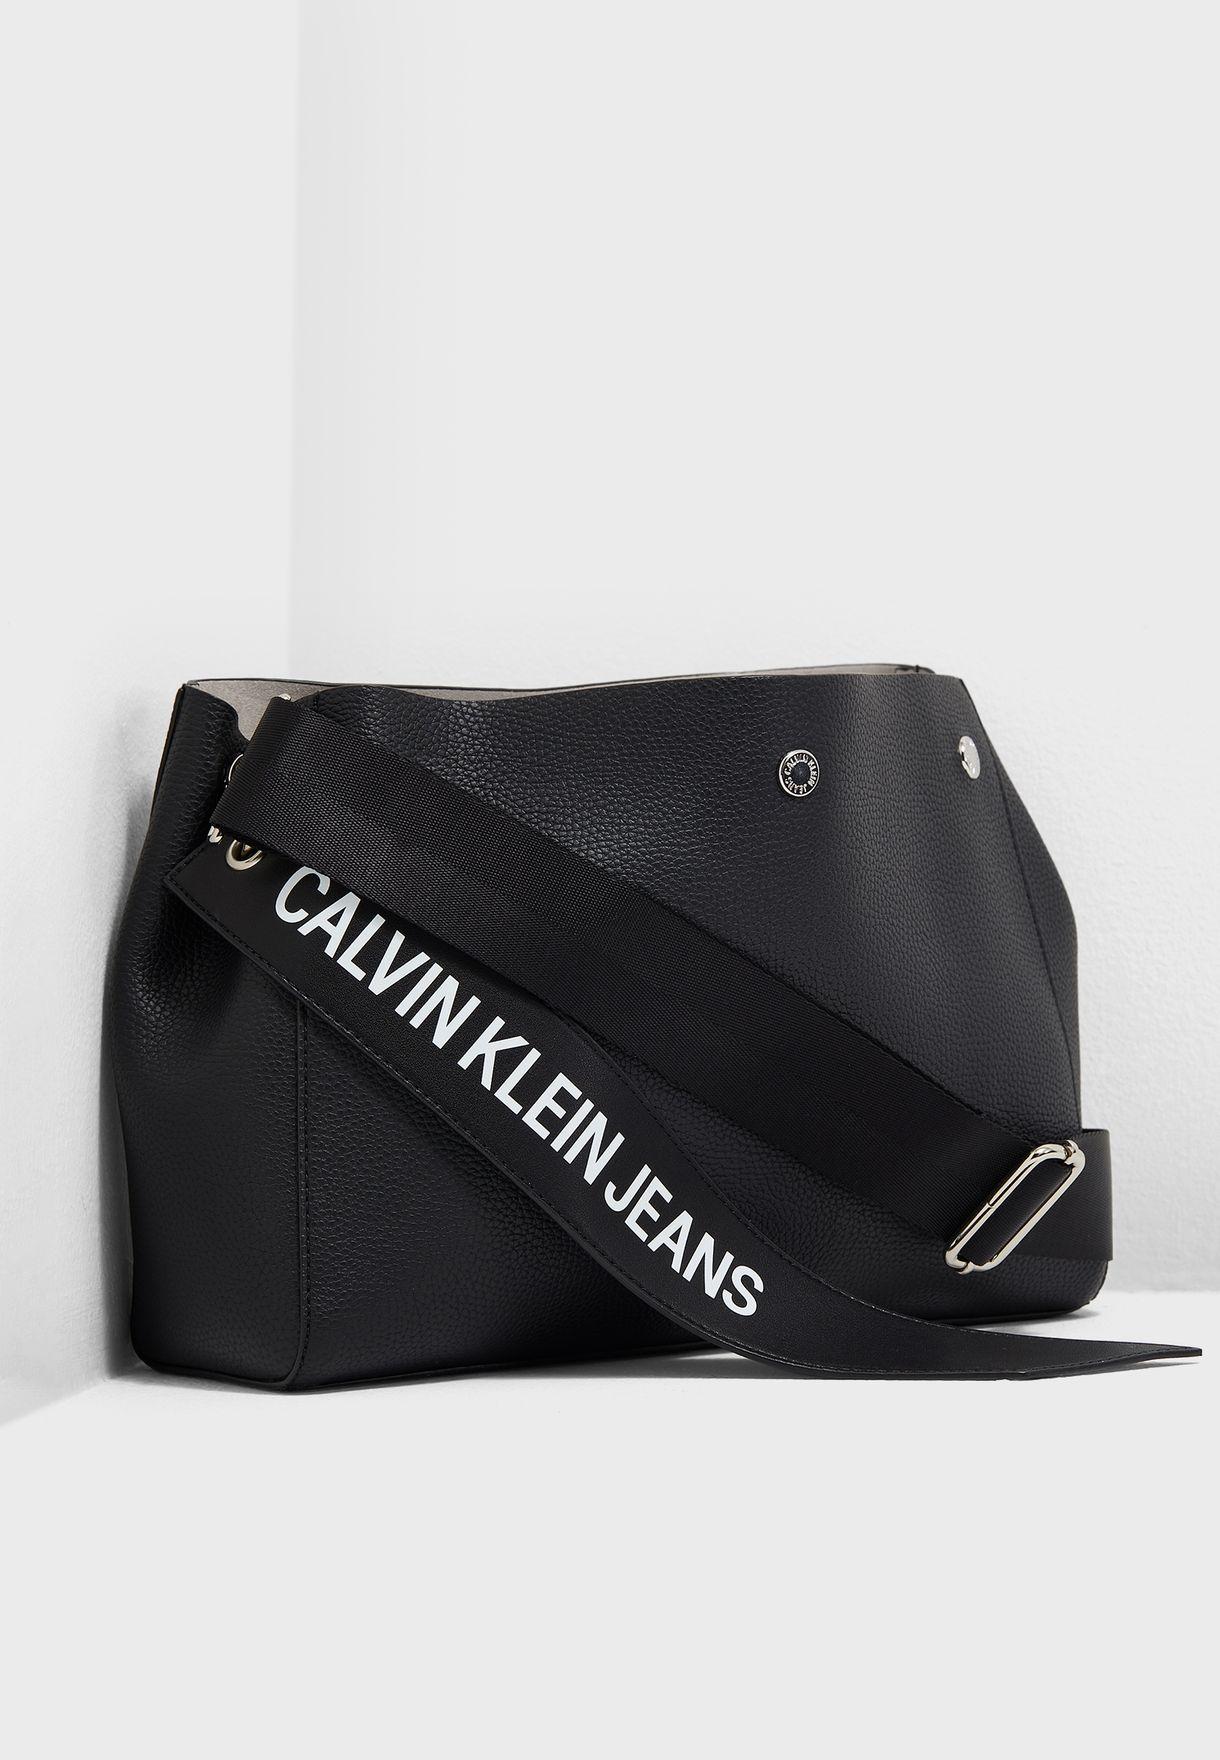 43576dac752 Shop Calvin Klein Jeans black Logo Banner Flap Crossbody K40K400825 ...